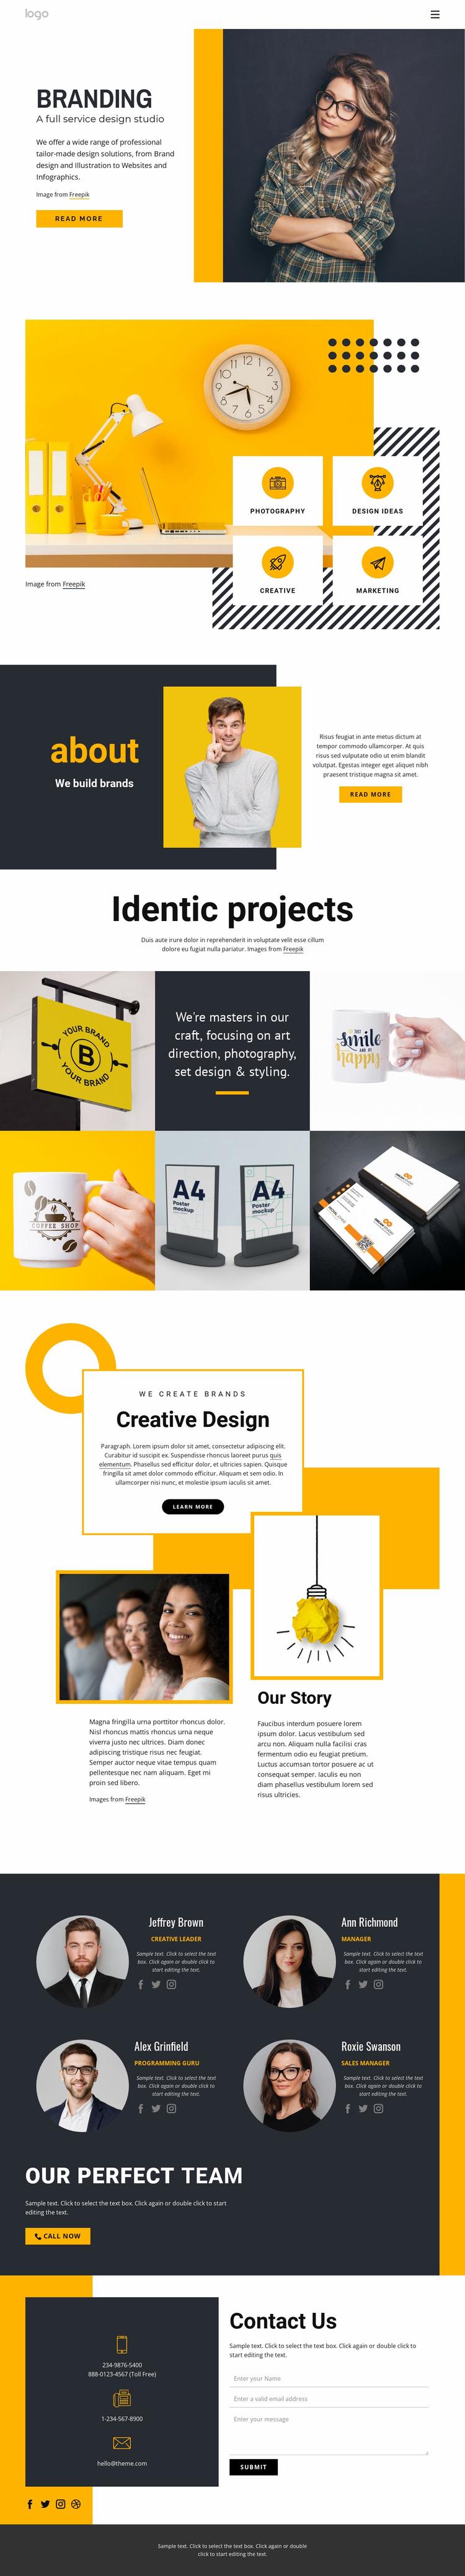 Full-service design studio Landing Page